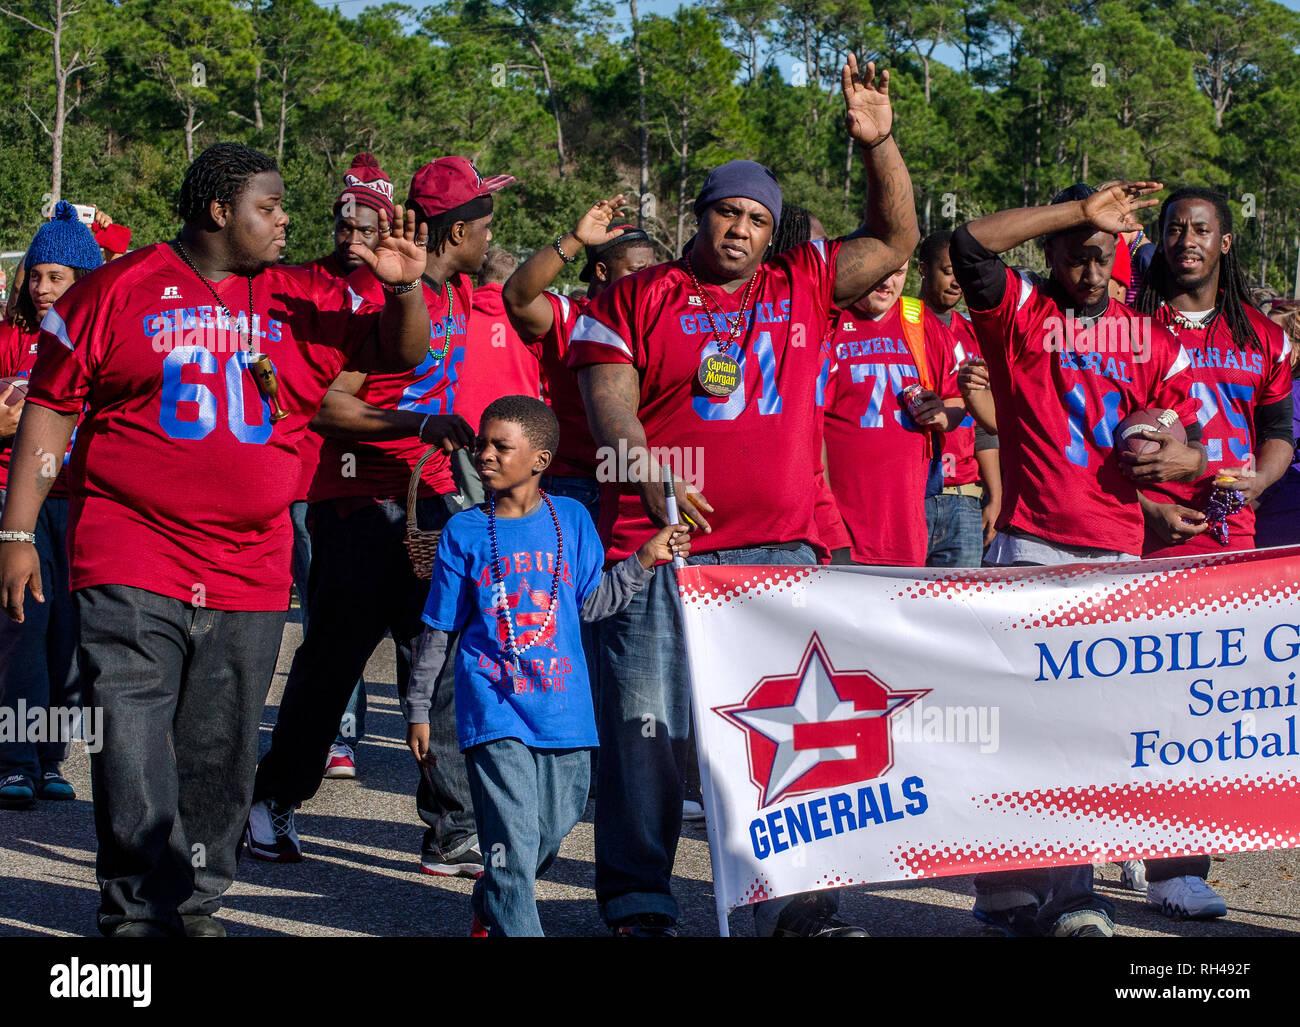 Football players march in the Krewe de la Dauphine parade in Dauphin Island, Alabama, Jan. 17, 2015, kicking off Mobile's Mardi Gras season. - Stock Image